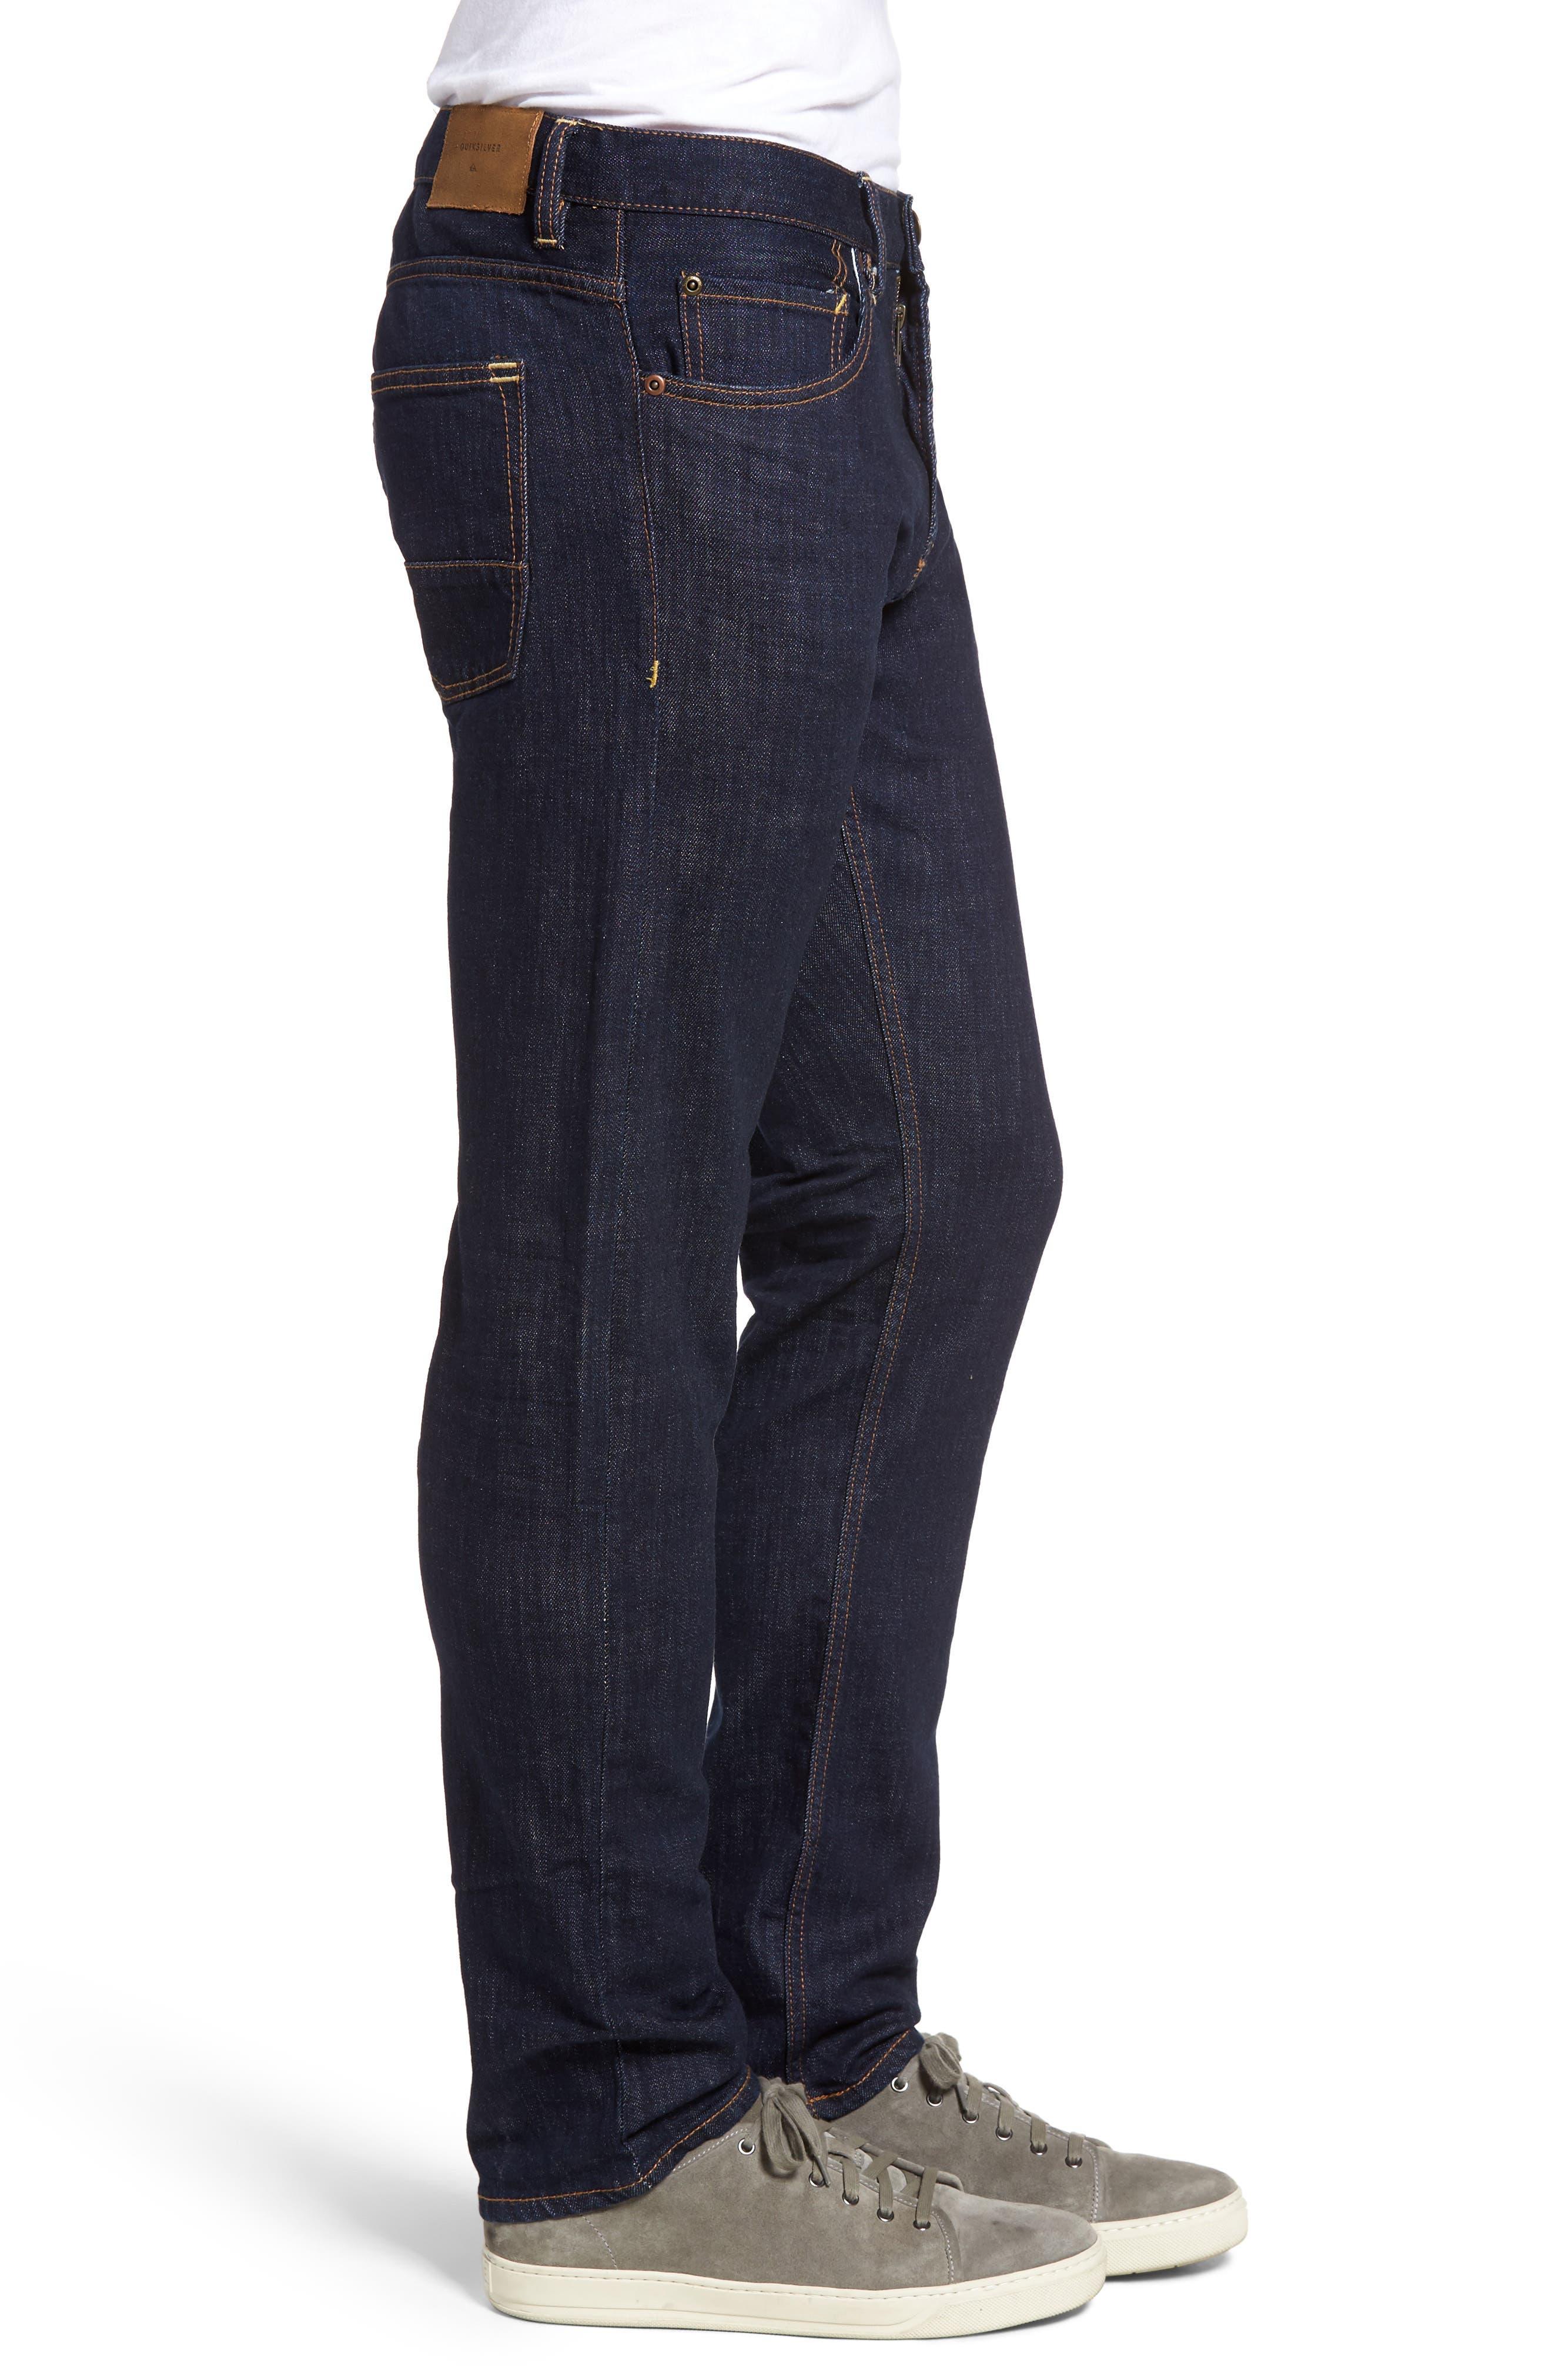 Revolver Slim Fit Jeans,                             Alternate thumbnail 3, color,                             401